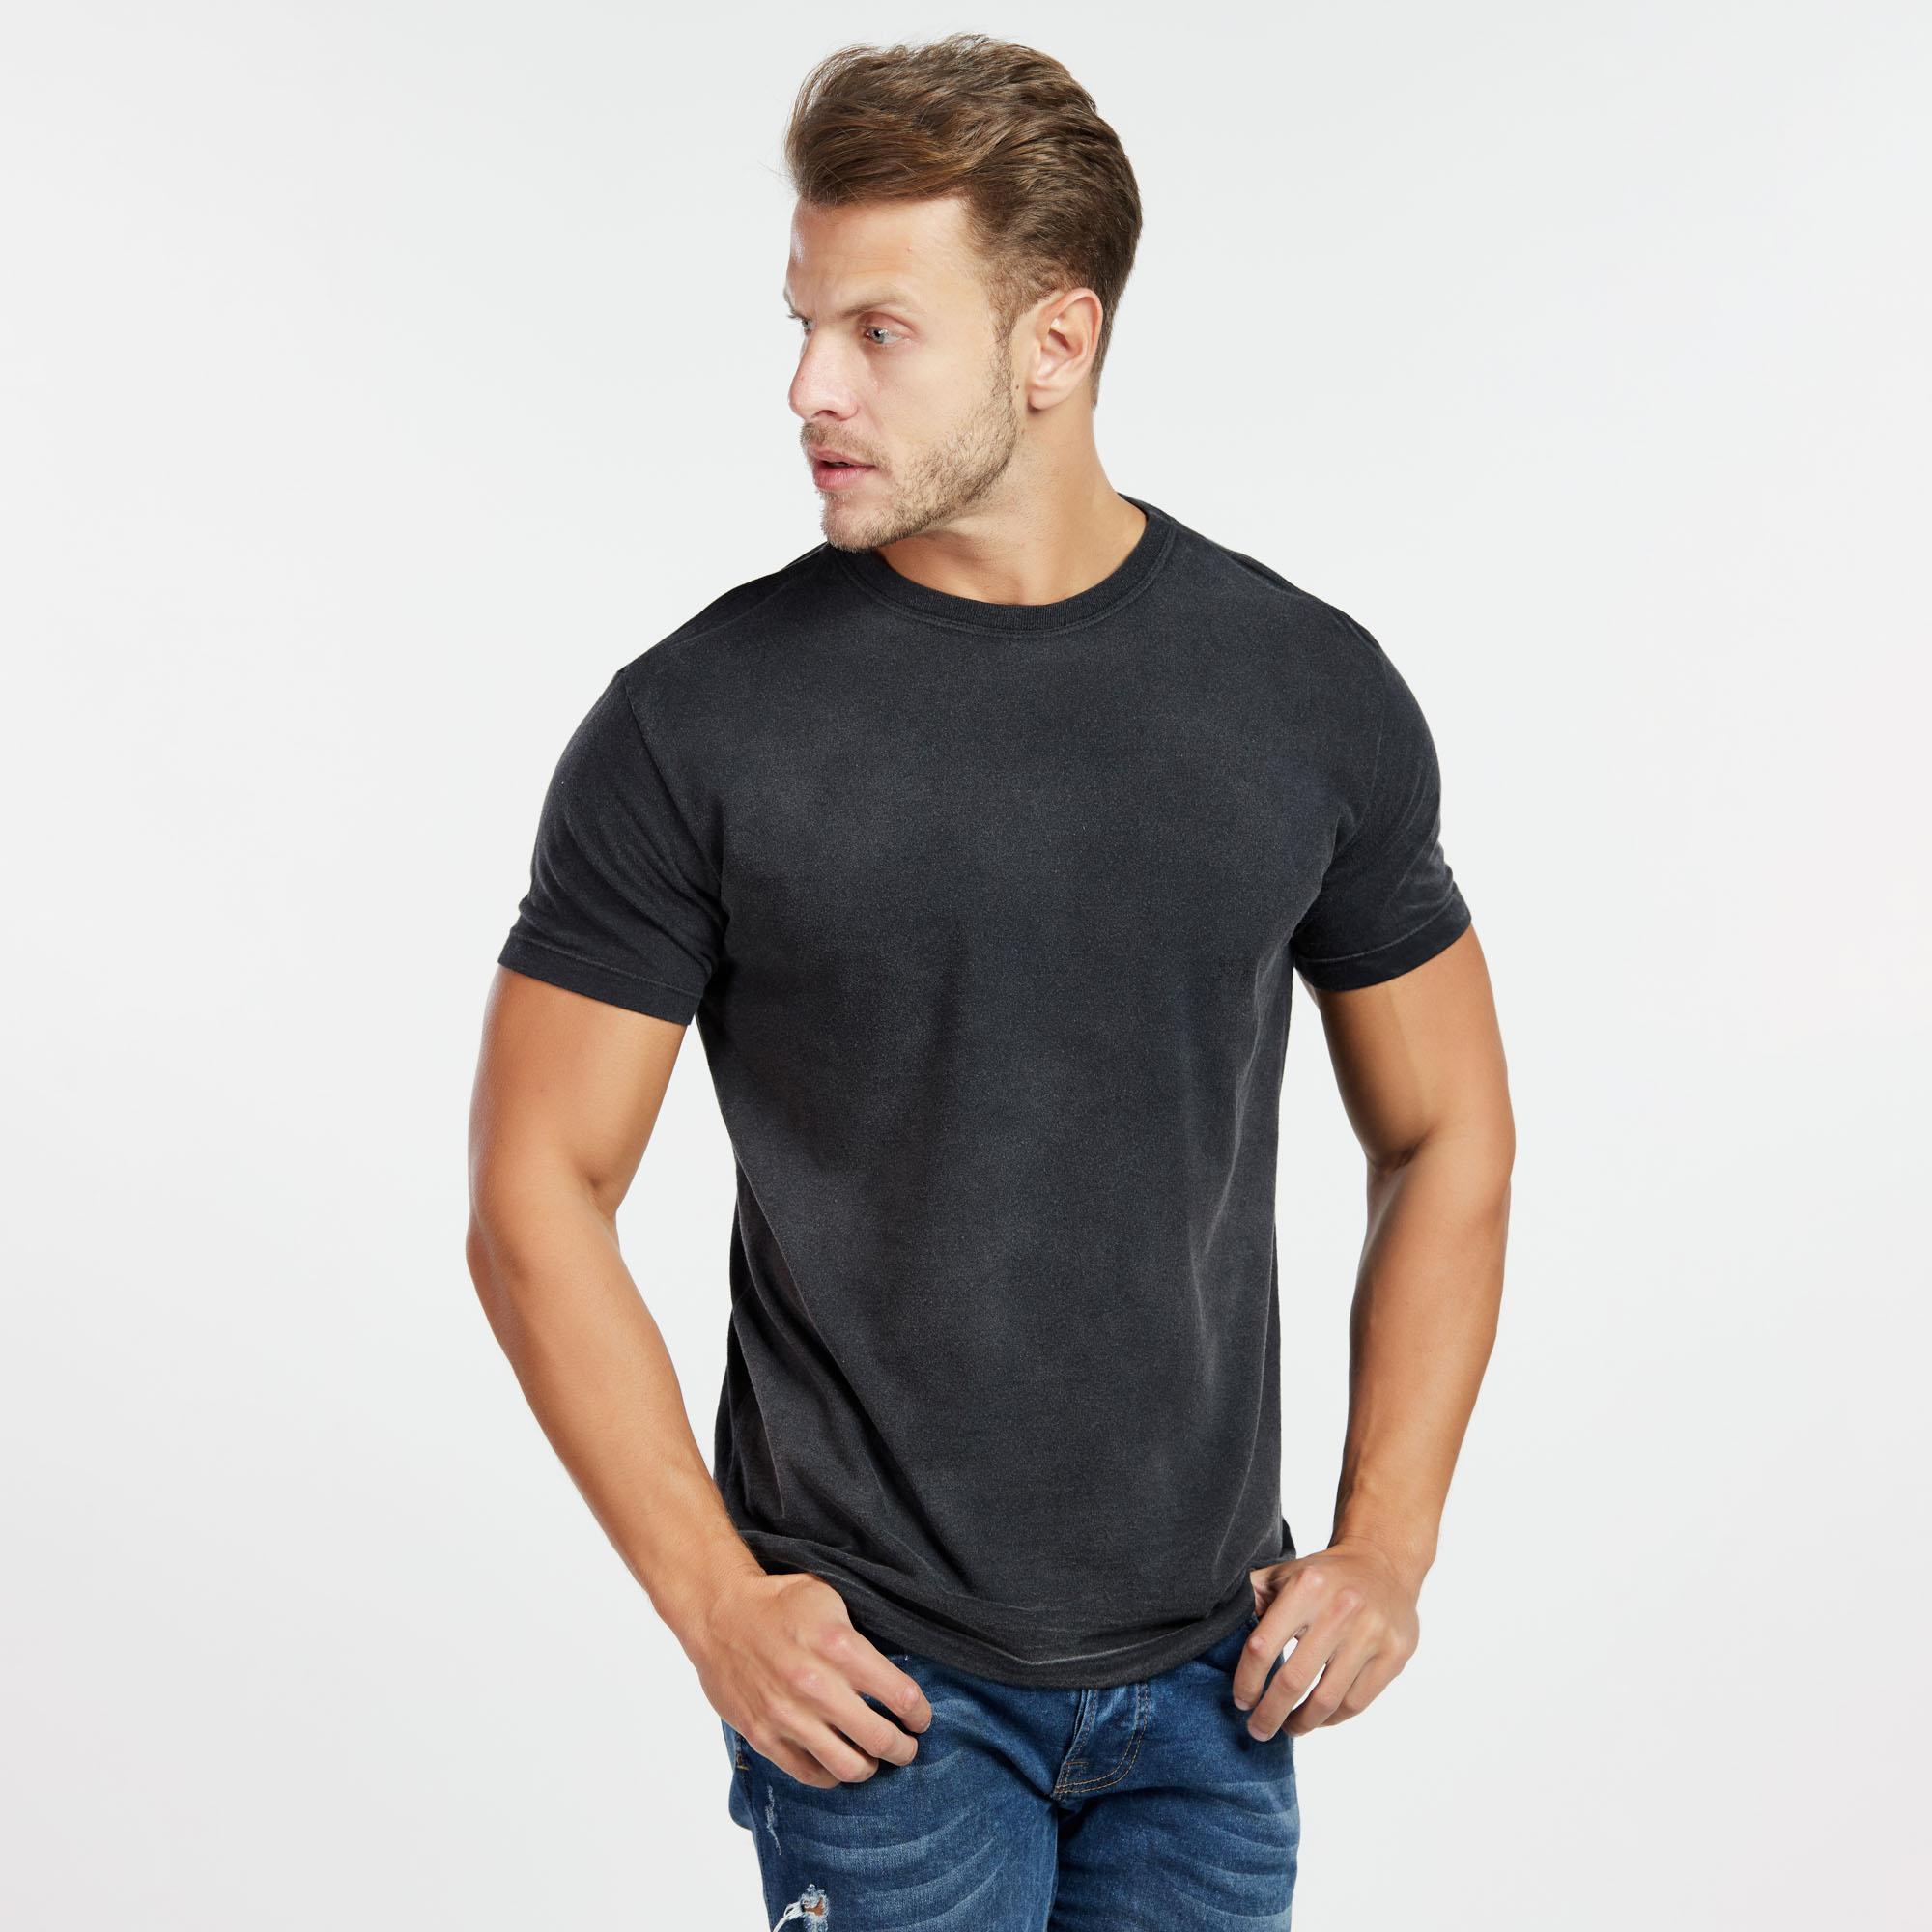 Camiseta Masculina Used Total Preta